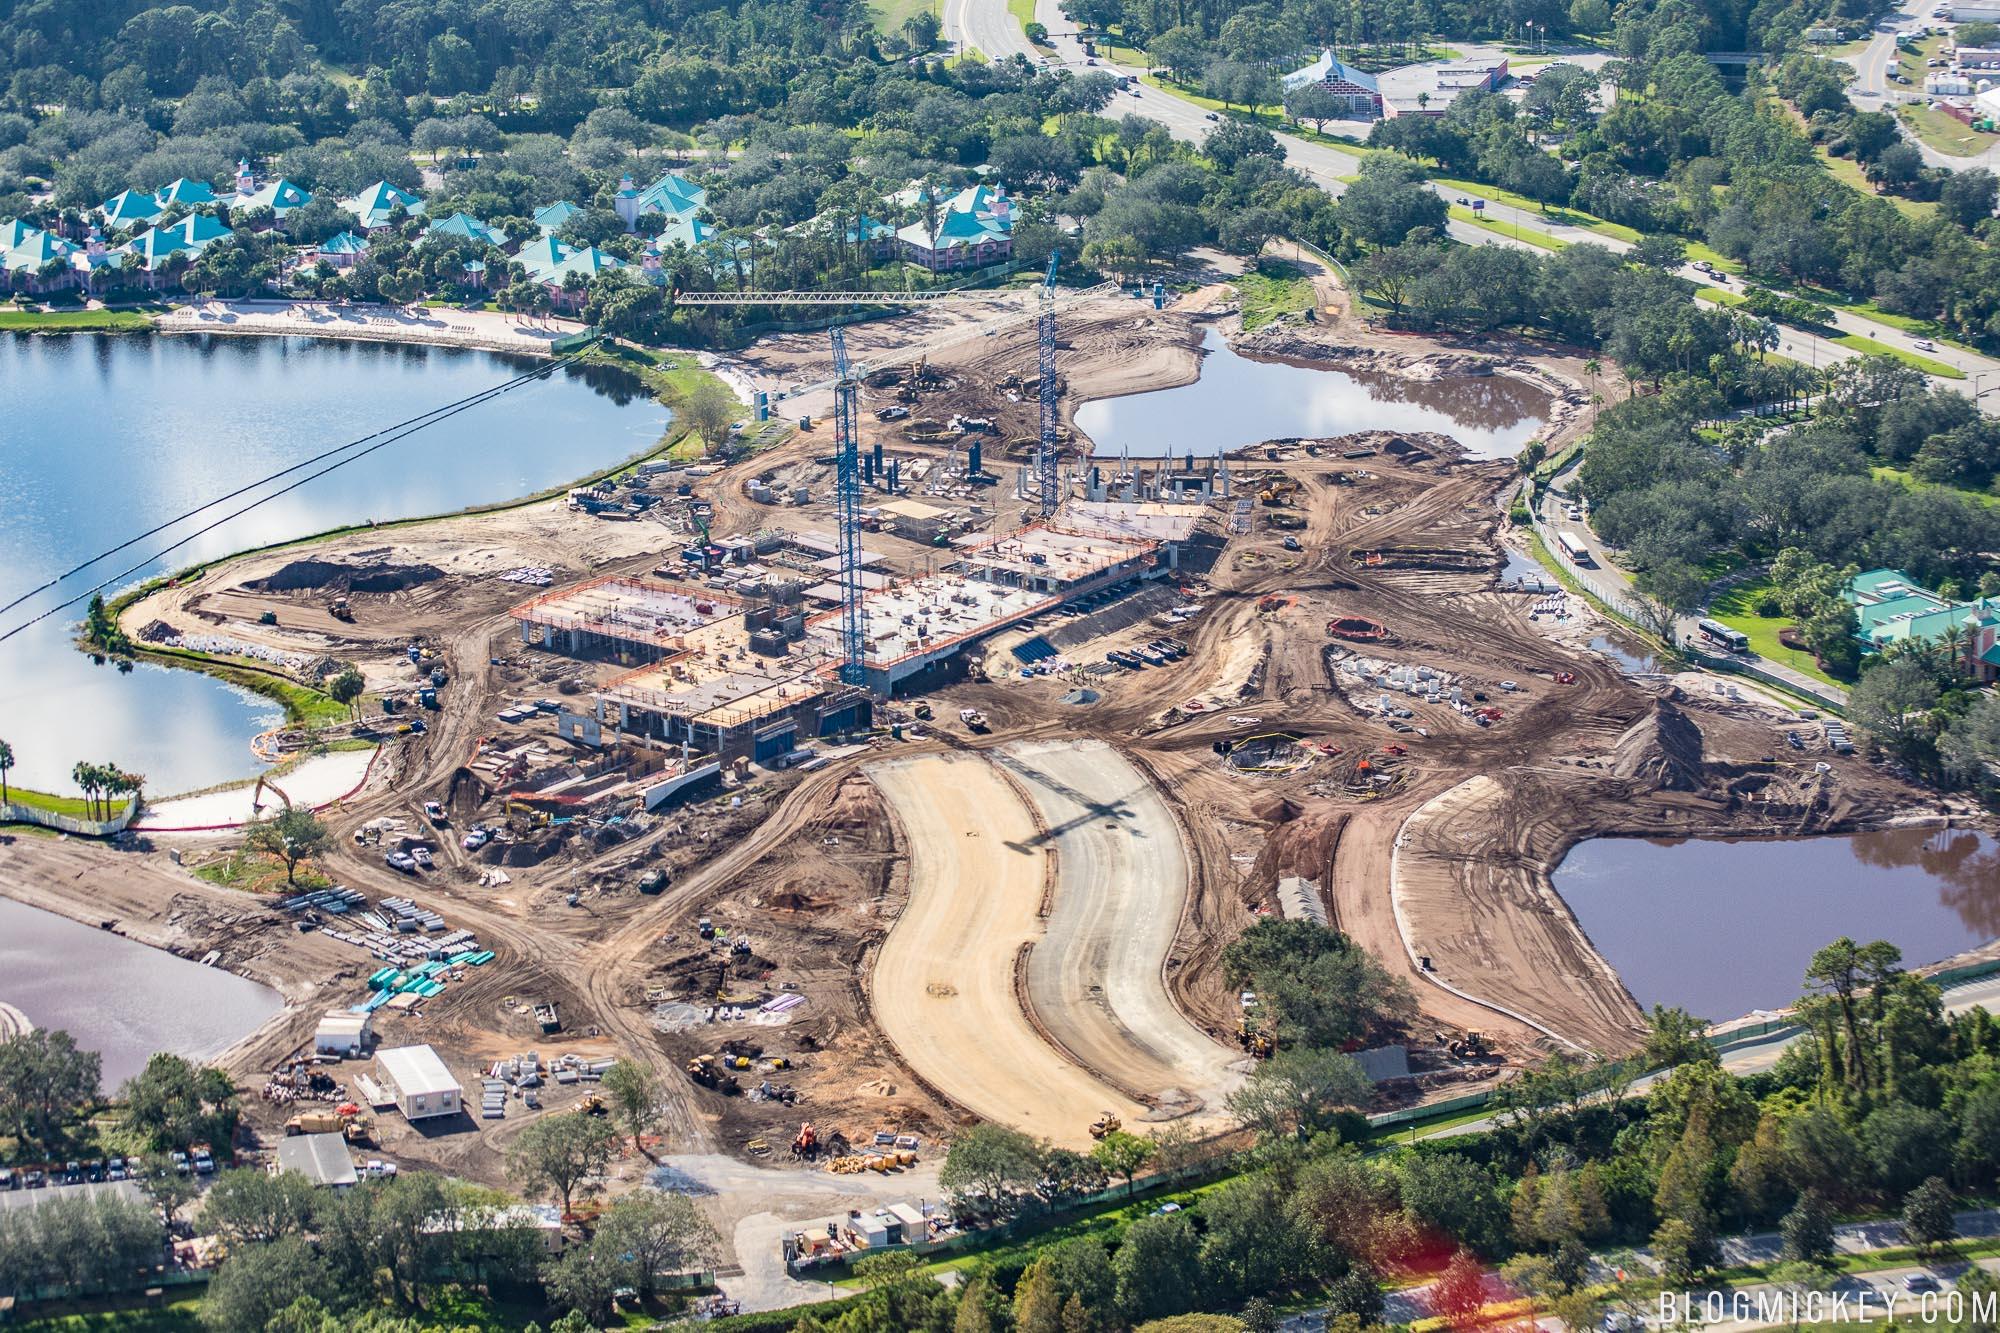 377ba51a1 PHOTOS  Disney Riviera Resort Construction Goes Vertical - Blog Mickey